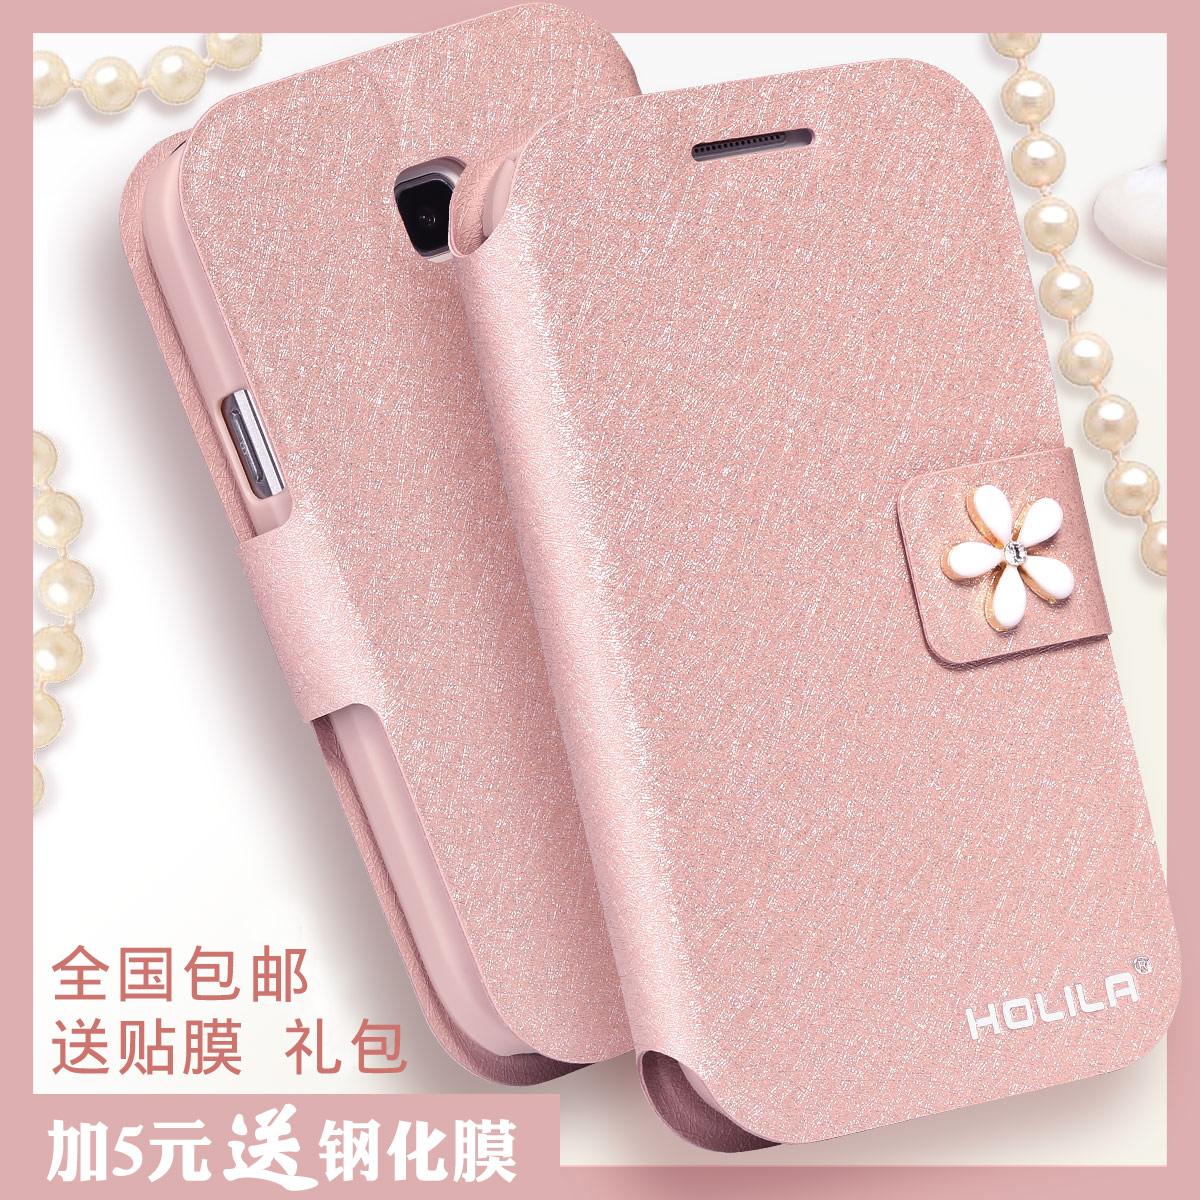 HOLILA 三星i699手机壳 s7572 GT-S7568手机套i739翻盖式保护套